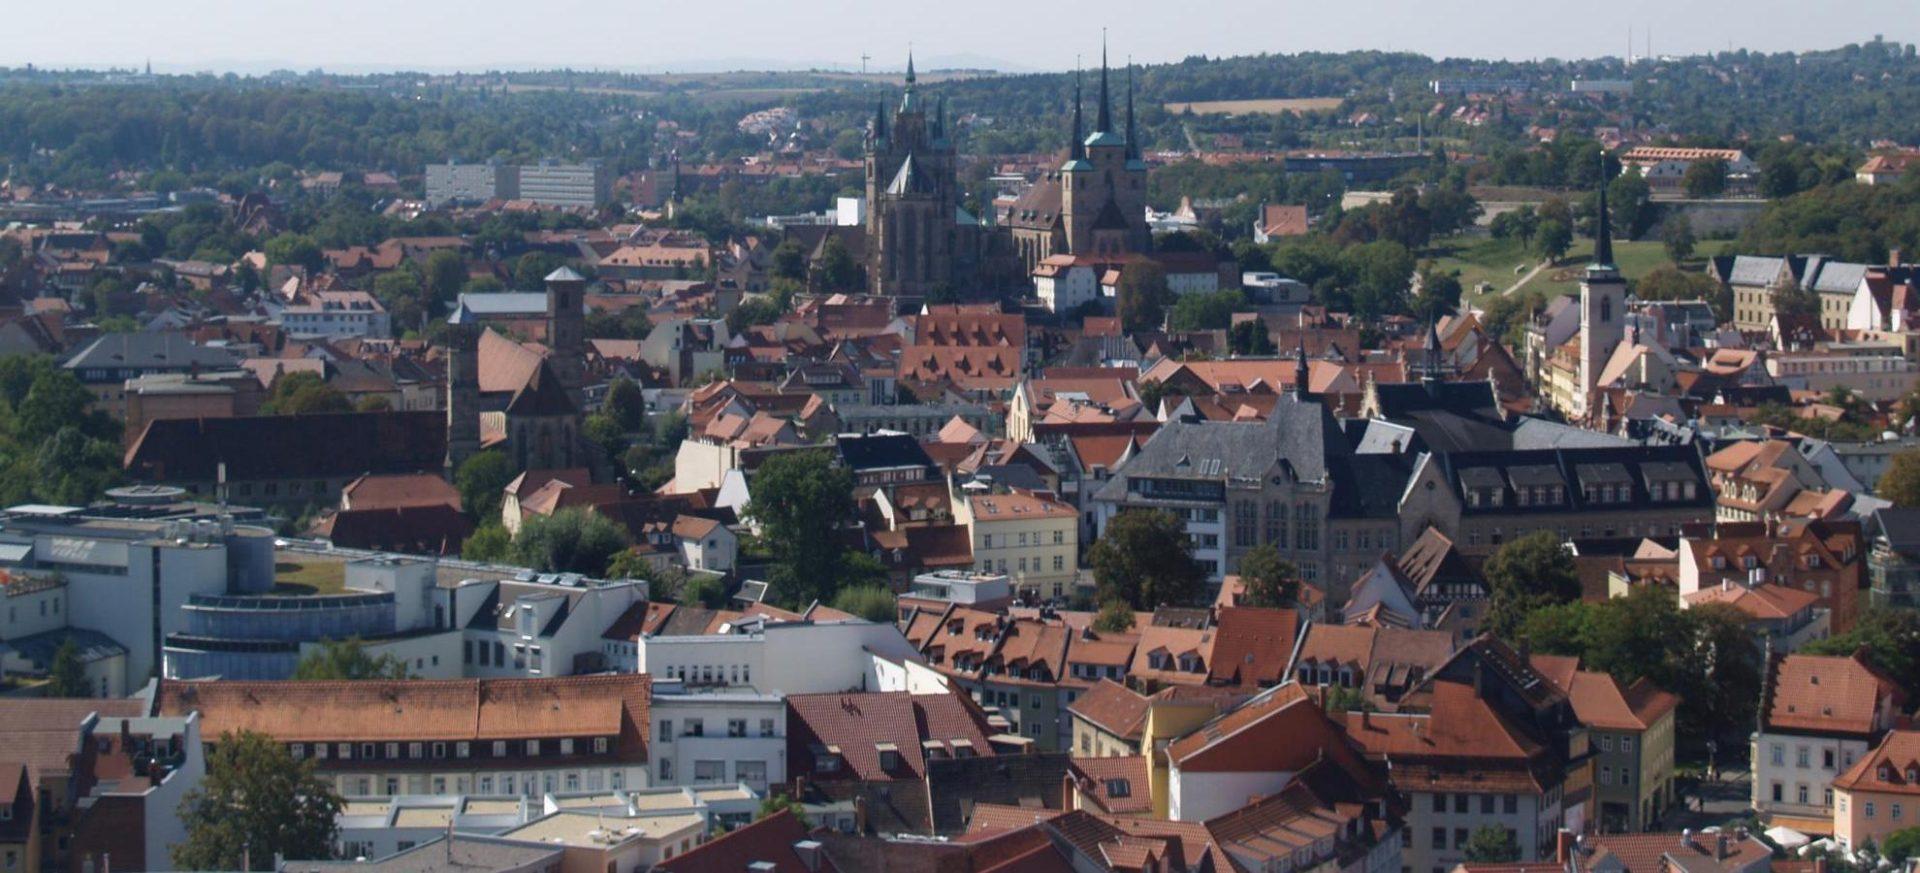 Blick über die Stadt / View over Erfurt